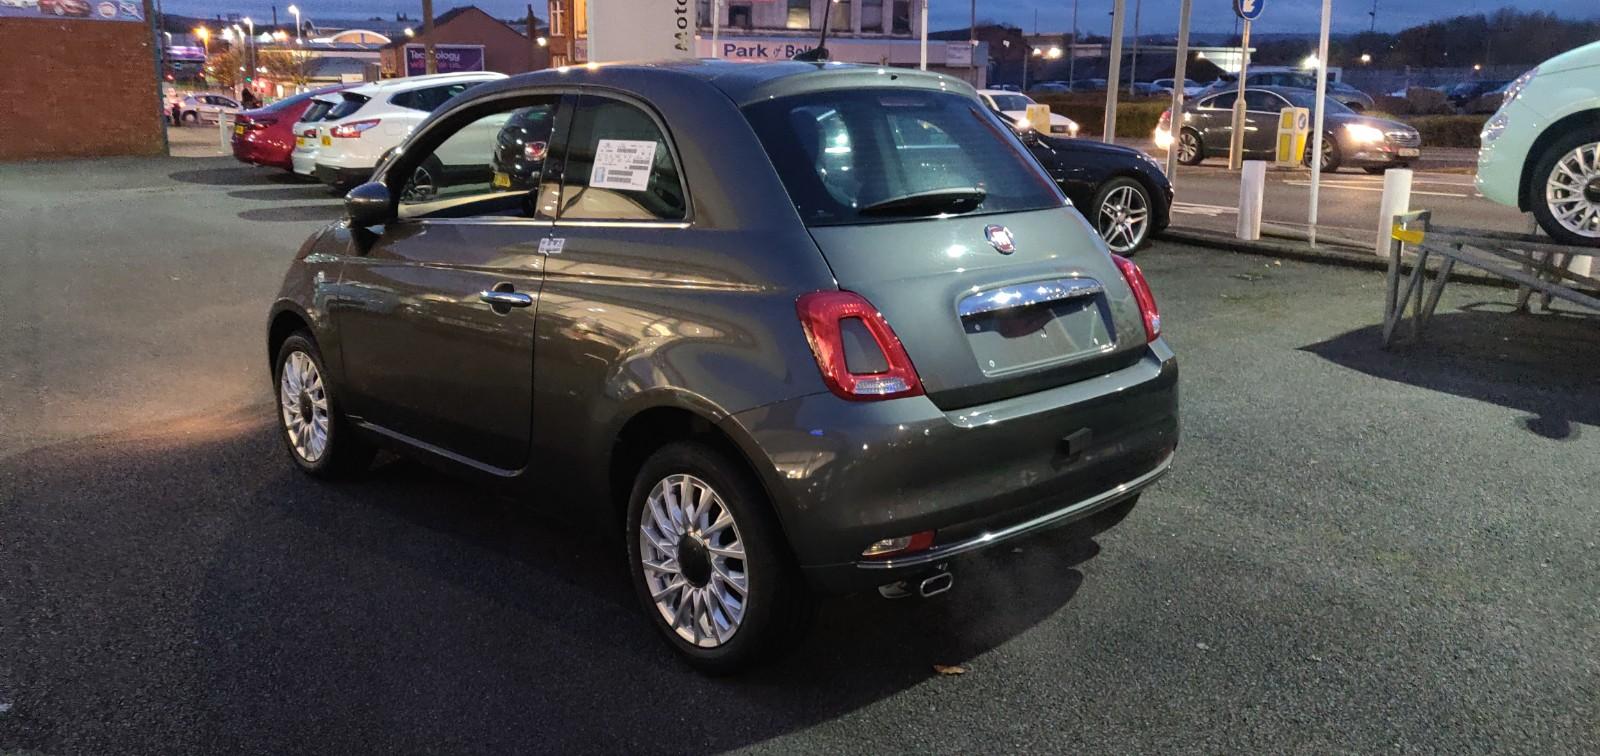 Fiat 500 1.2 Lounge 3dr image 9